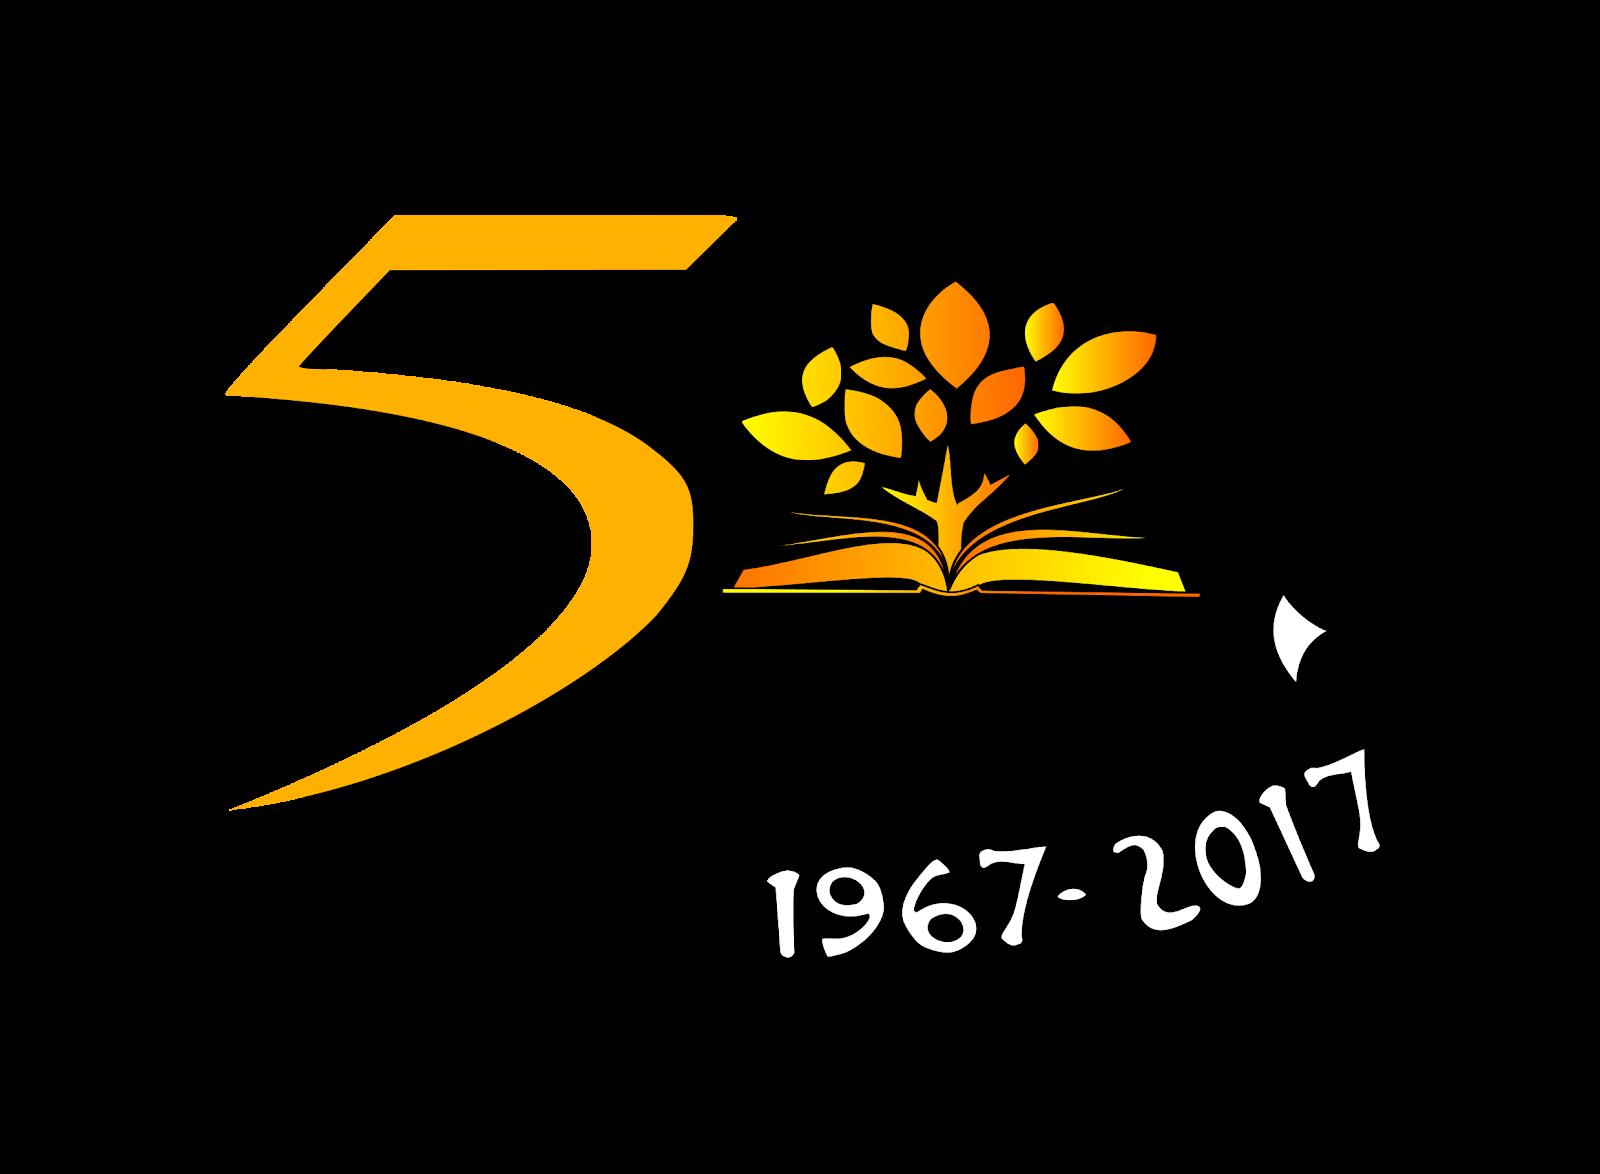 50 Aniversario 1967 / 2017